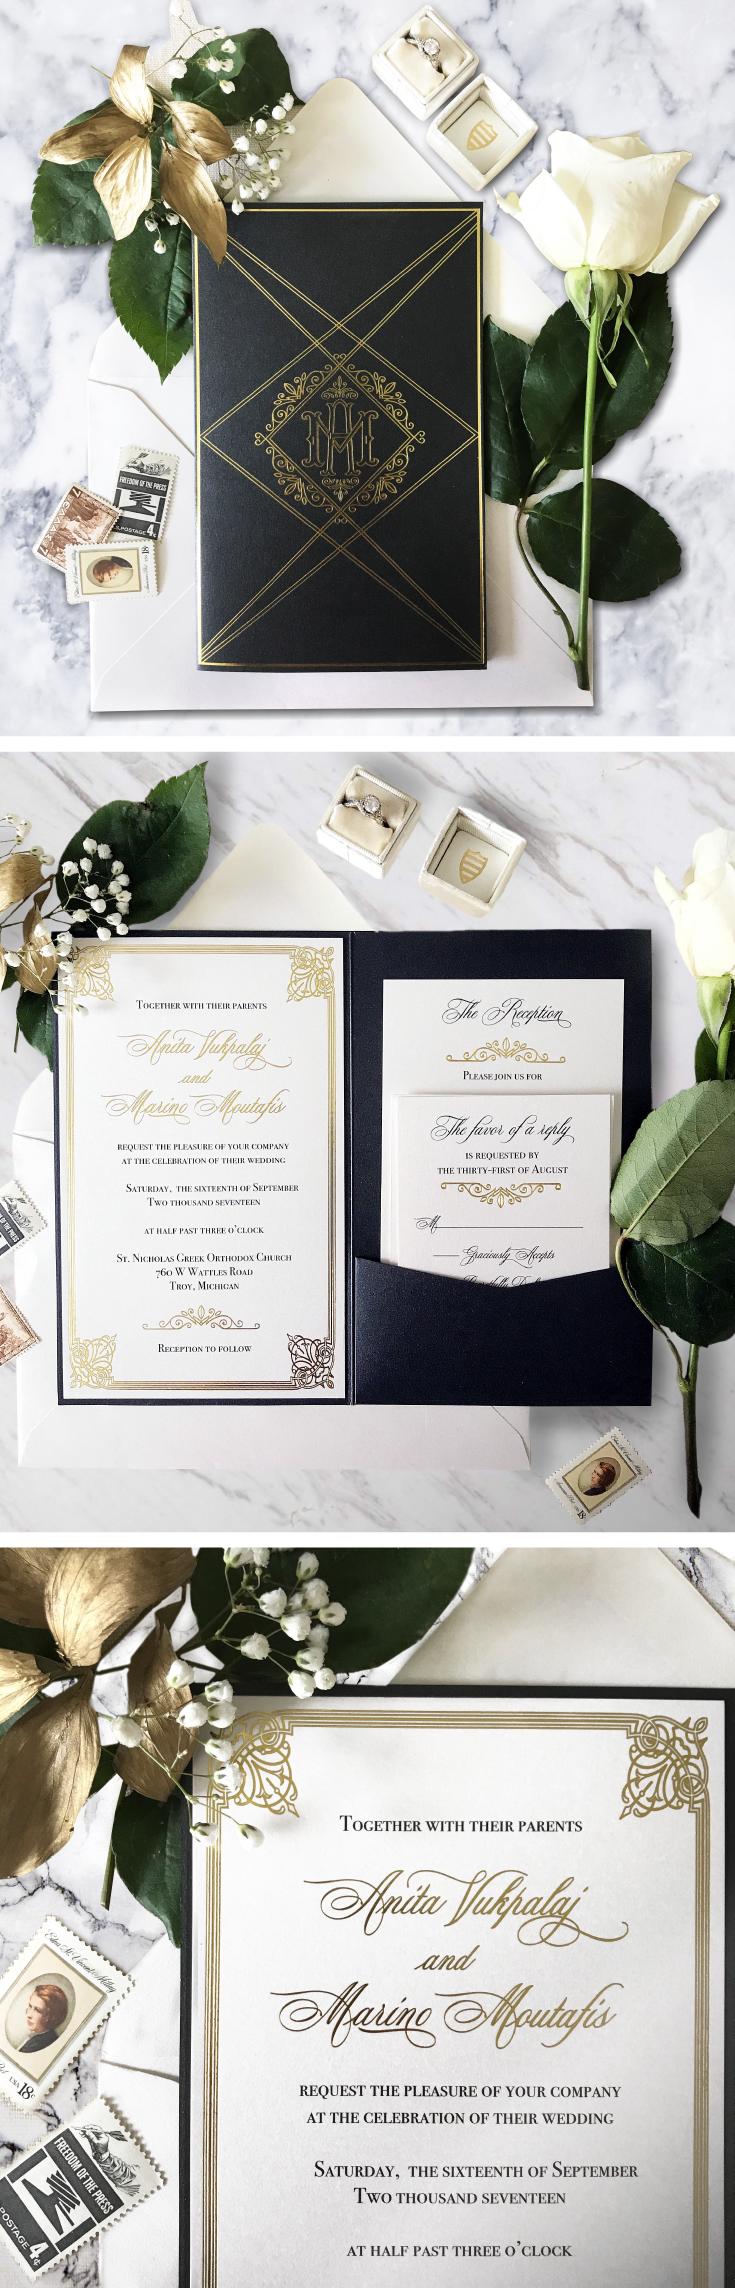 Portfolio | Our Wedding Invitation Designs | Pinterest | Roaring ...